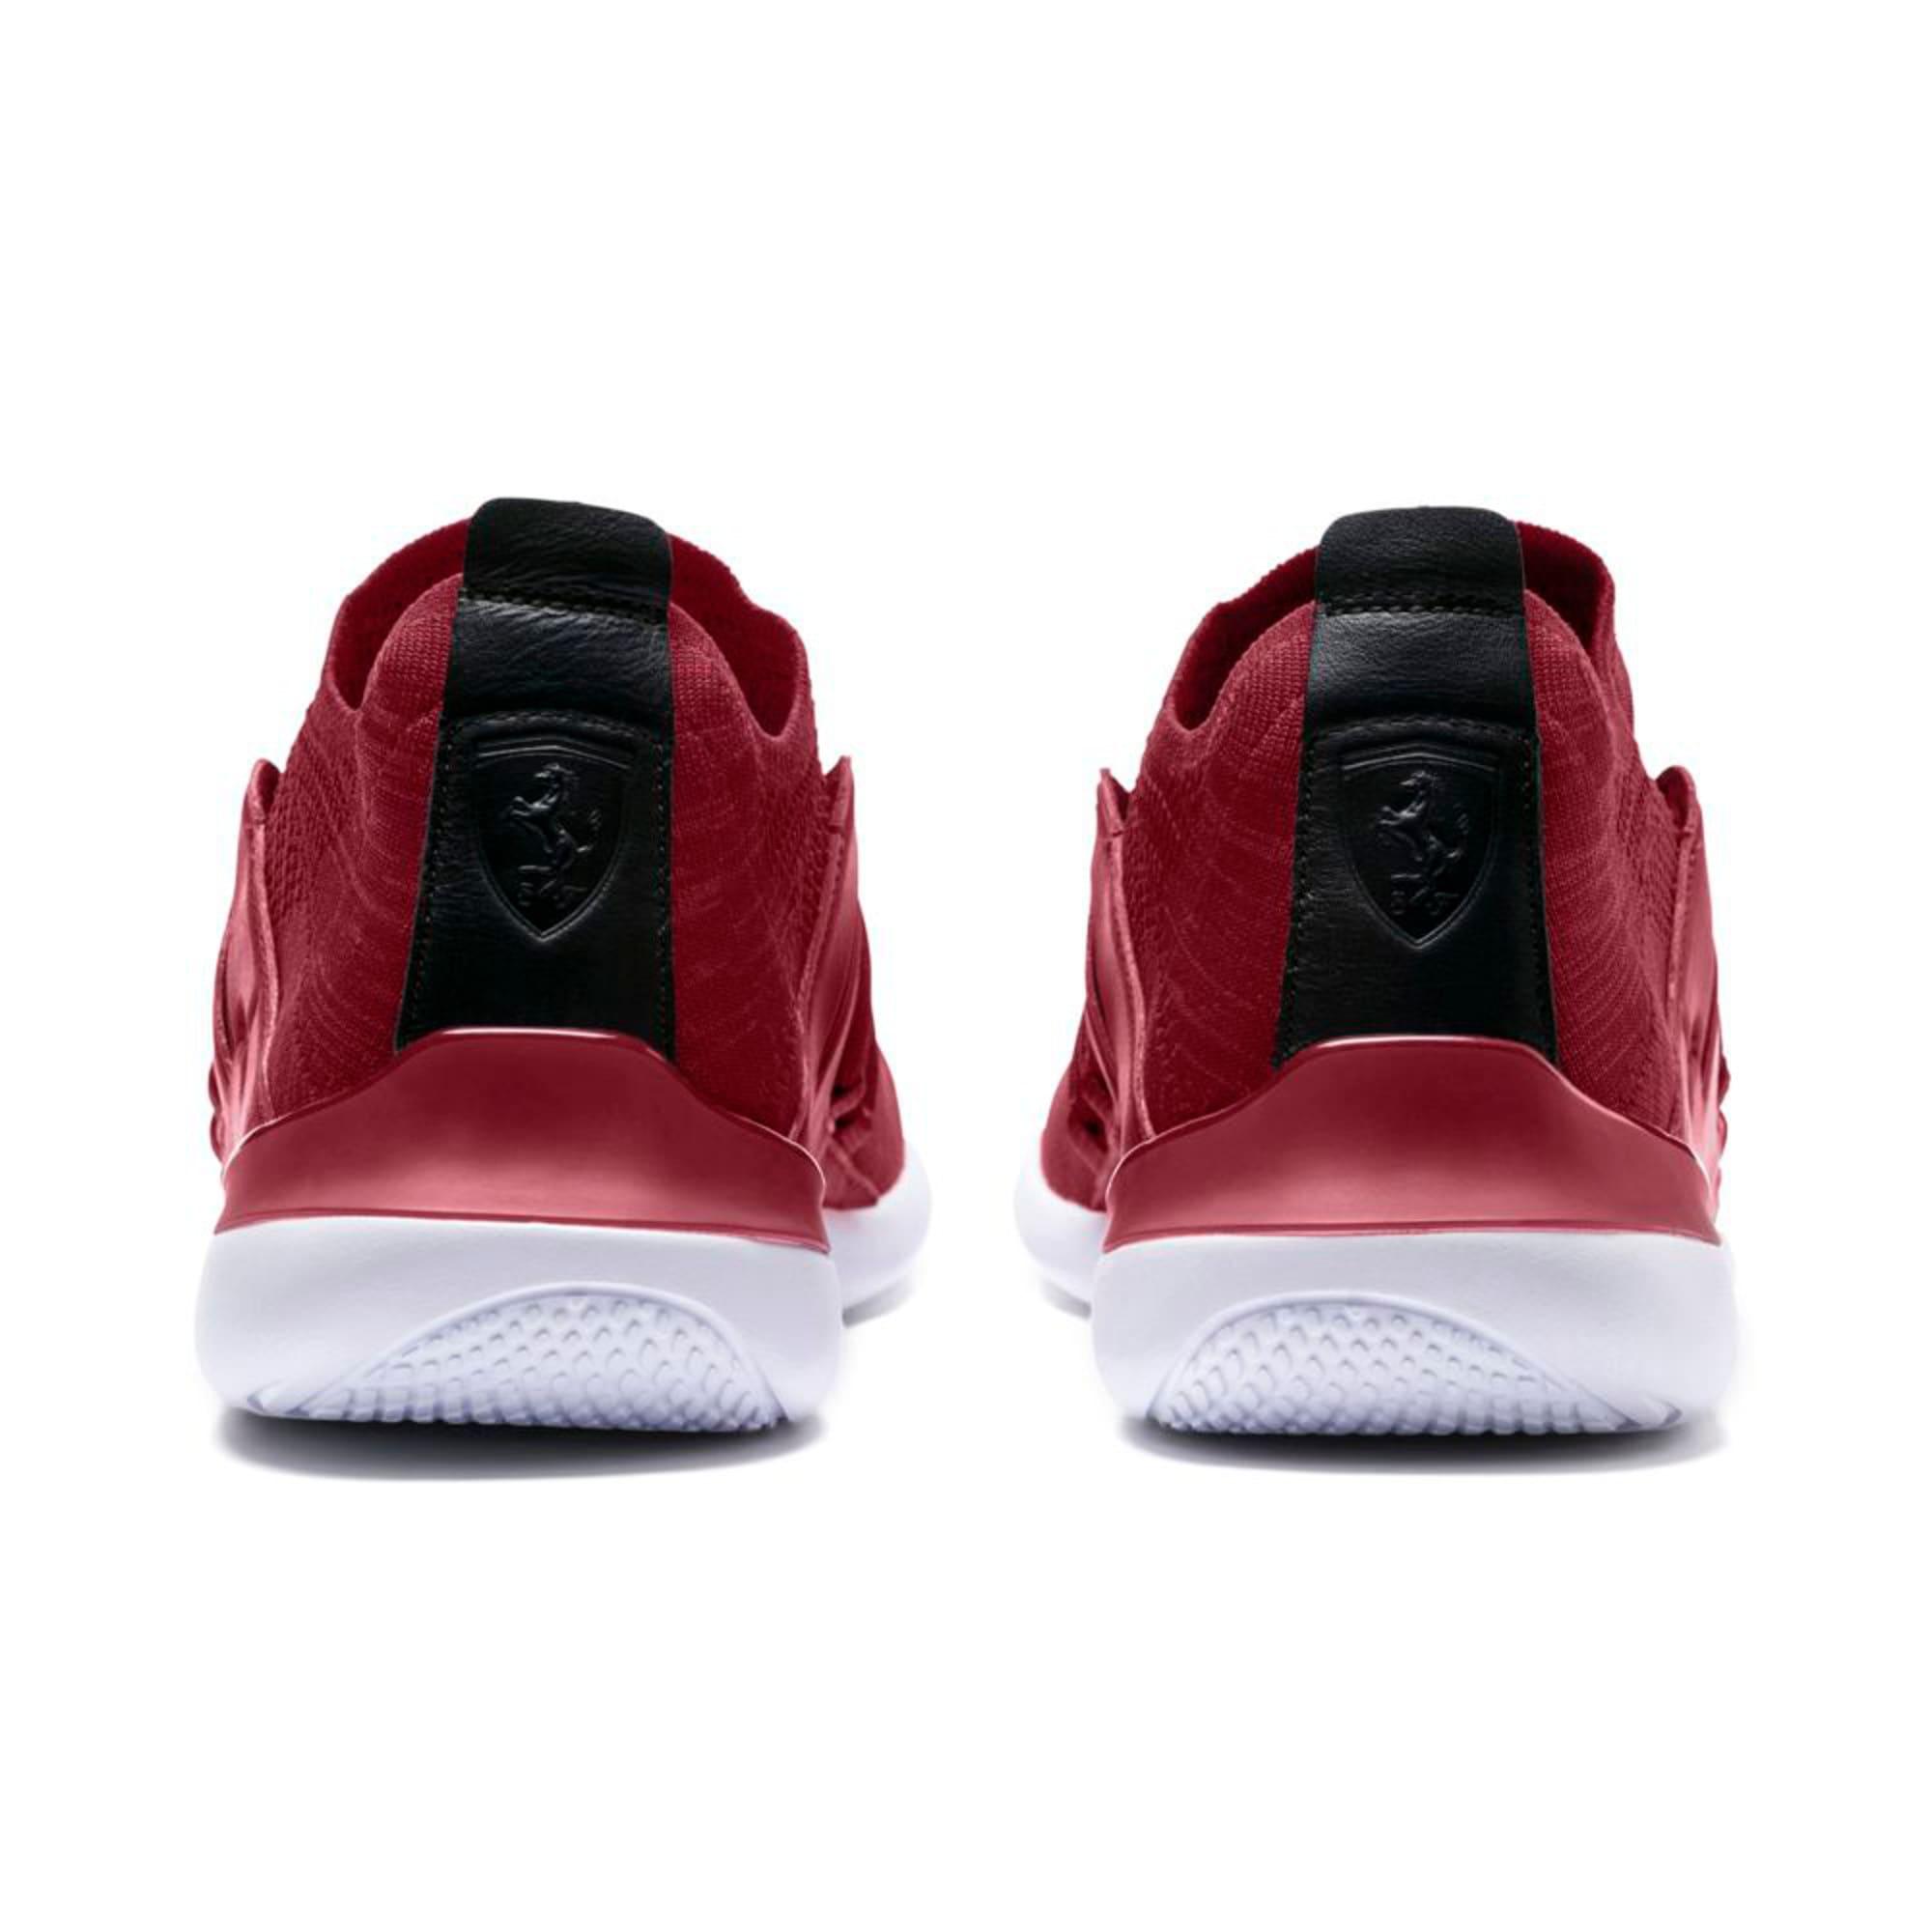 Thumbnail 2 of Ferrari Evo Cat Lace Lifestyle Shoes, Pomegranate-Bossa Nova-Wht, medium-IND